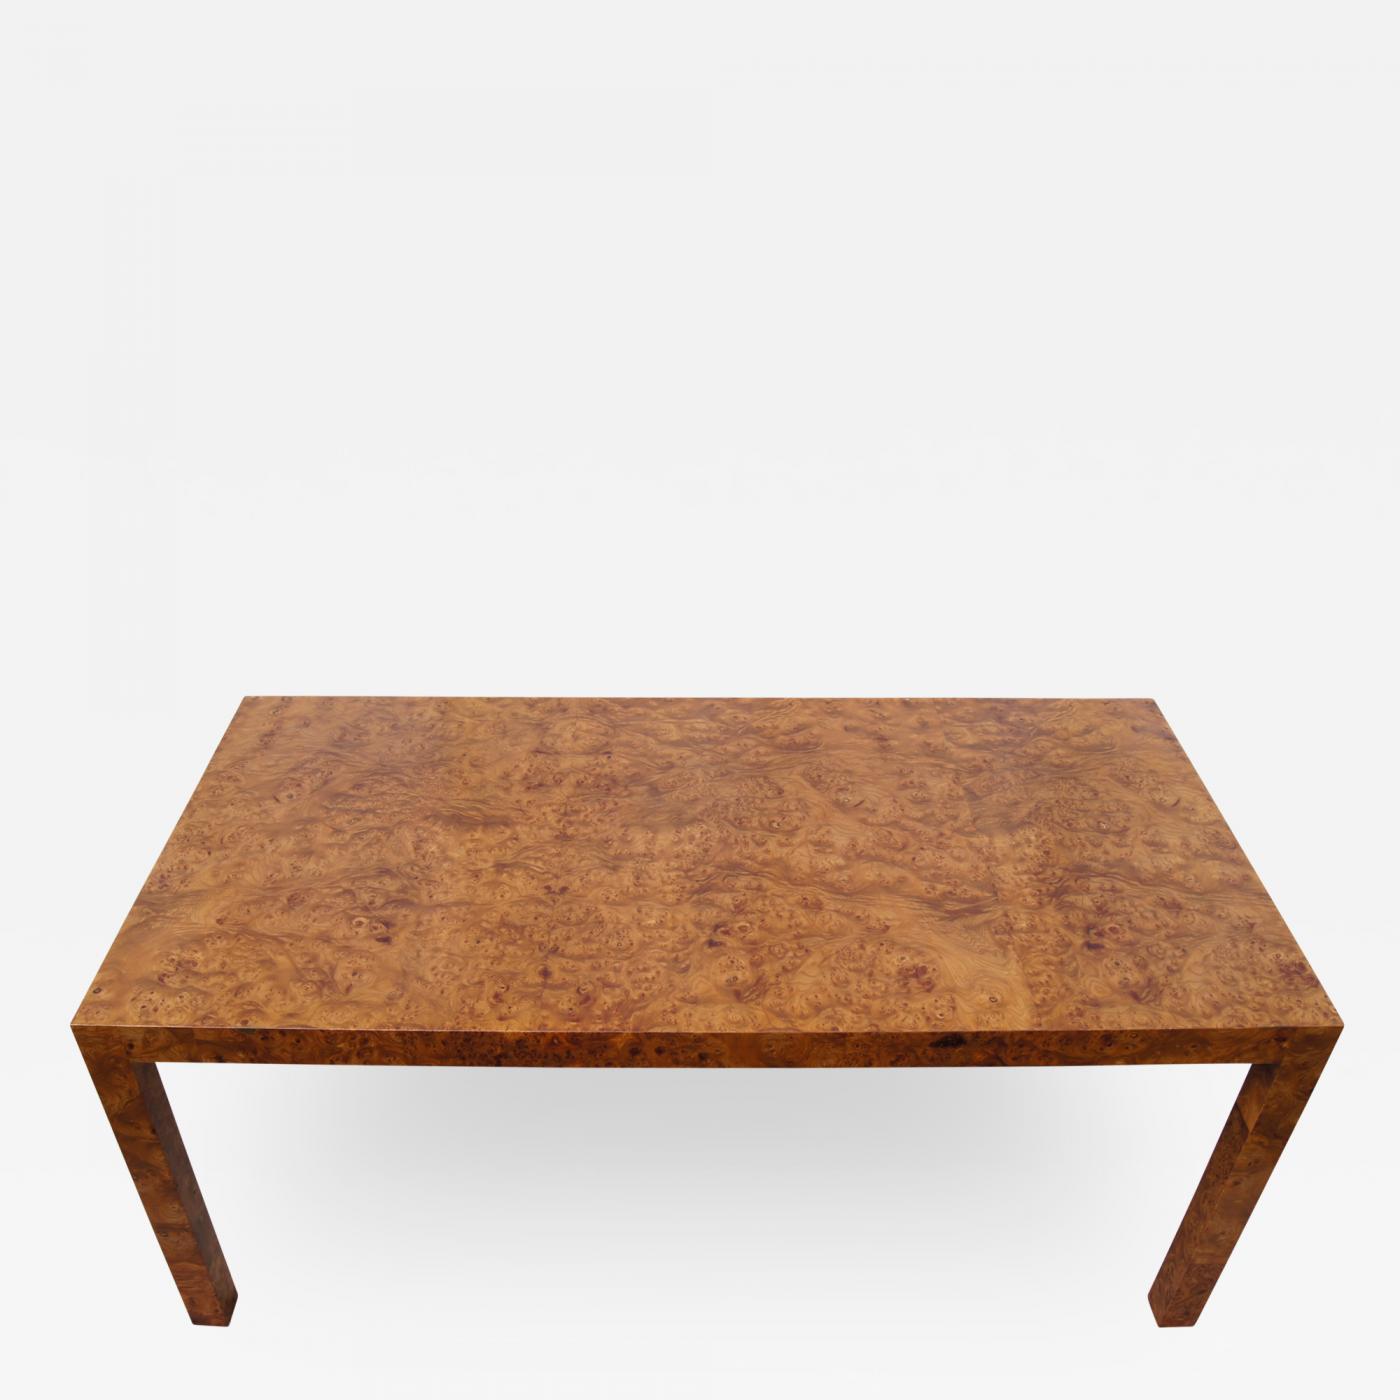 Custom Parsons Coffee Table in Walnut Burlwood